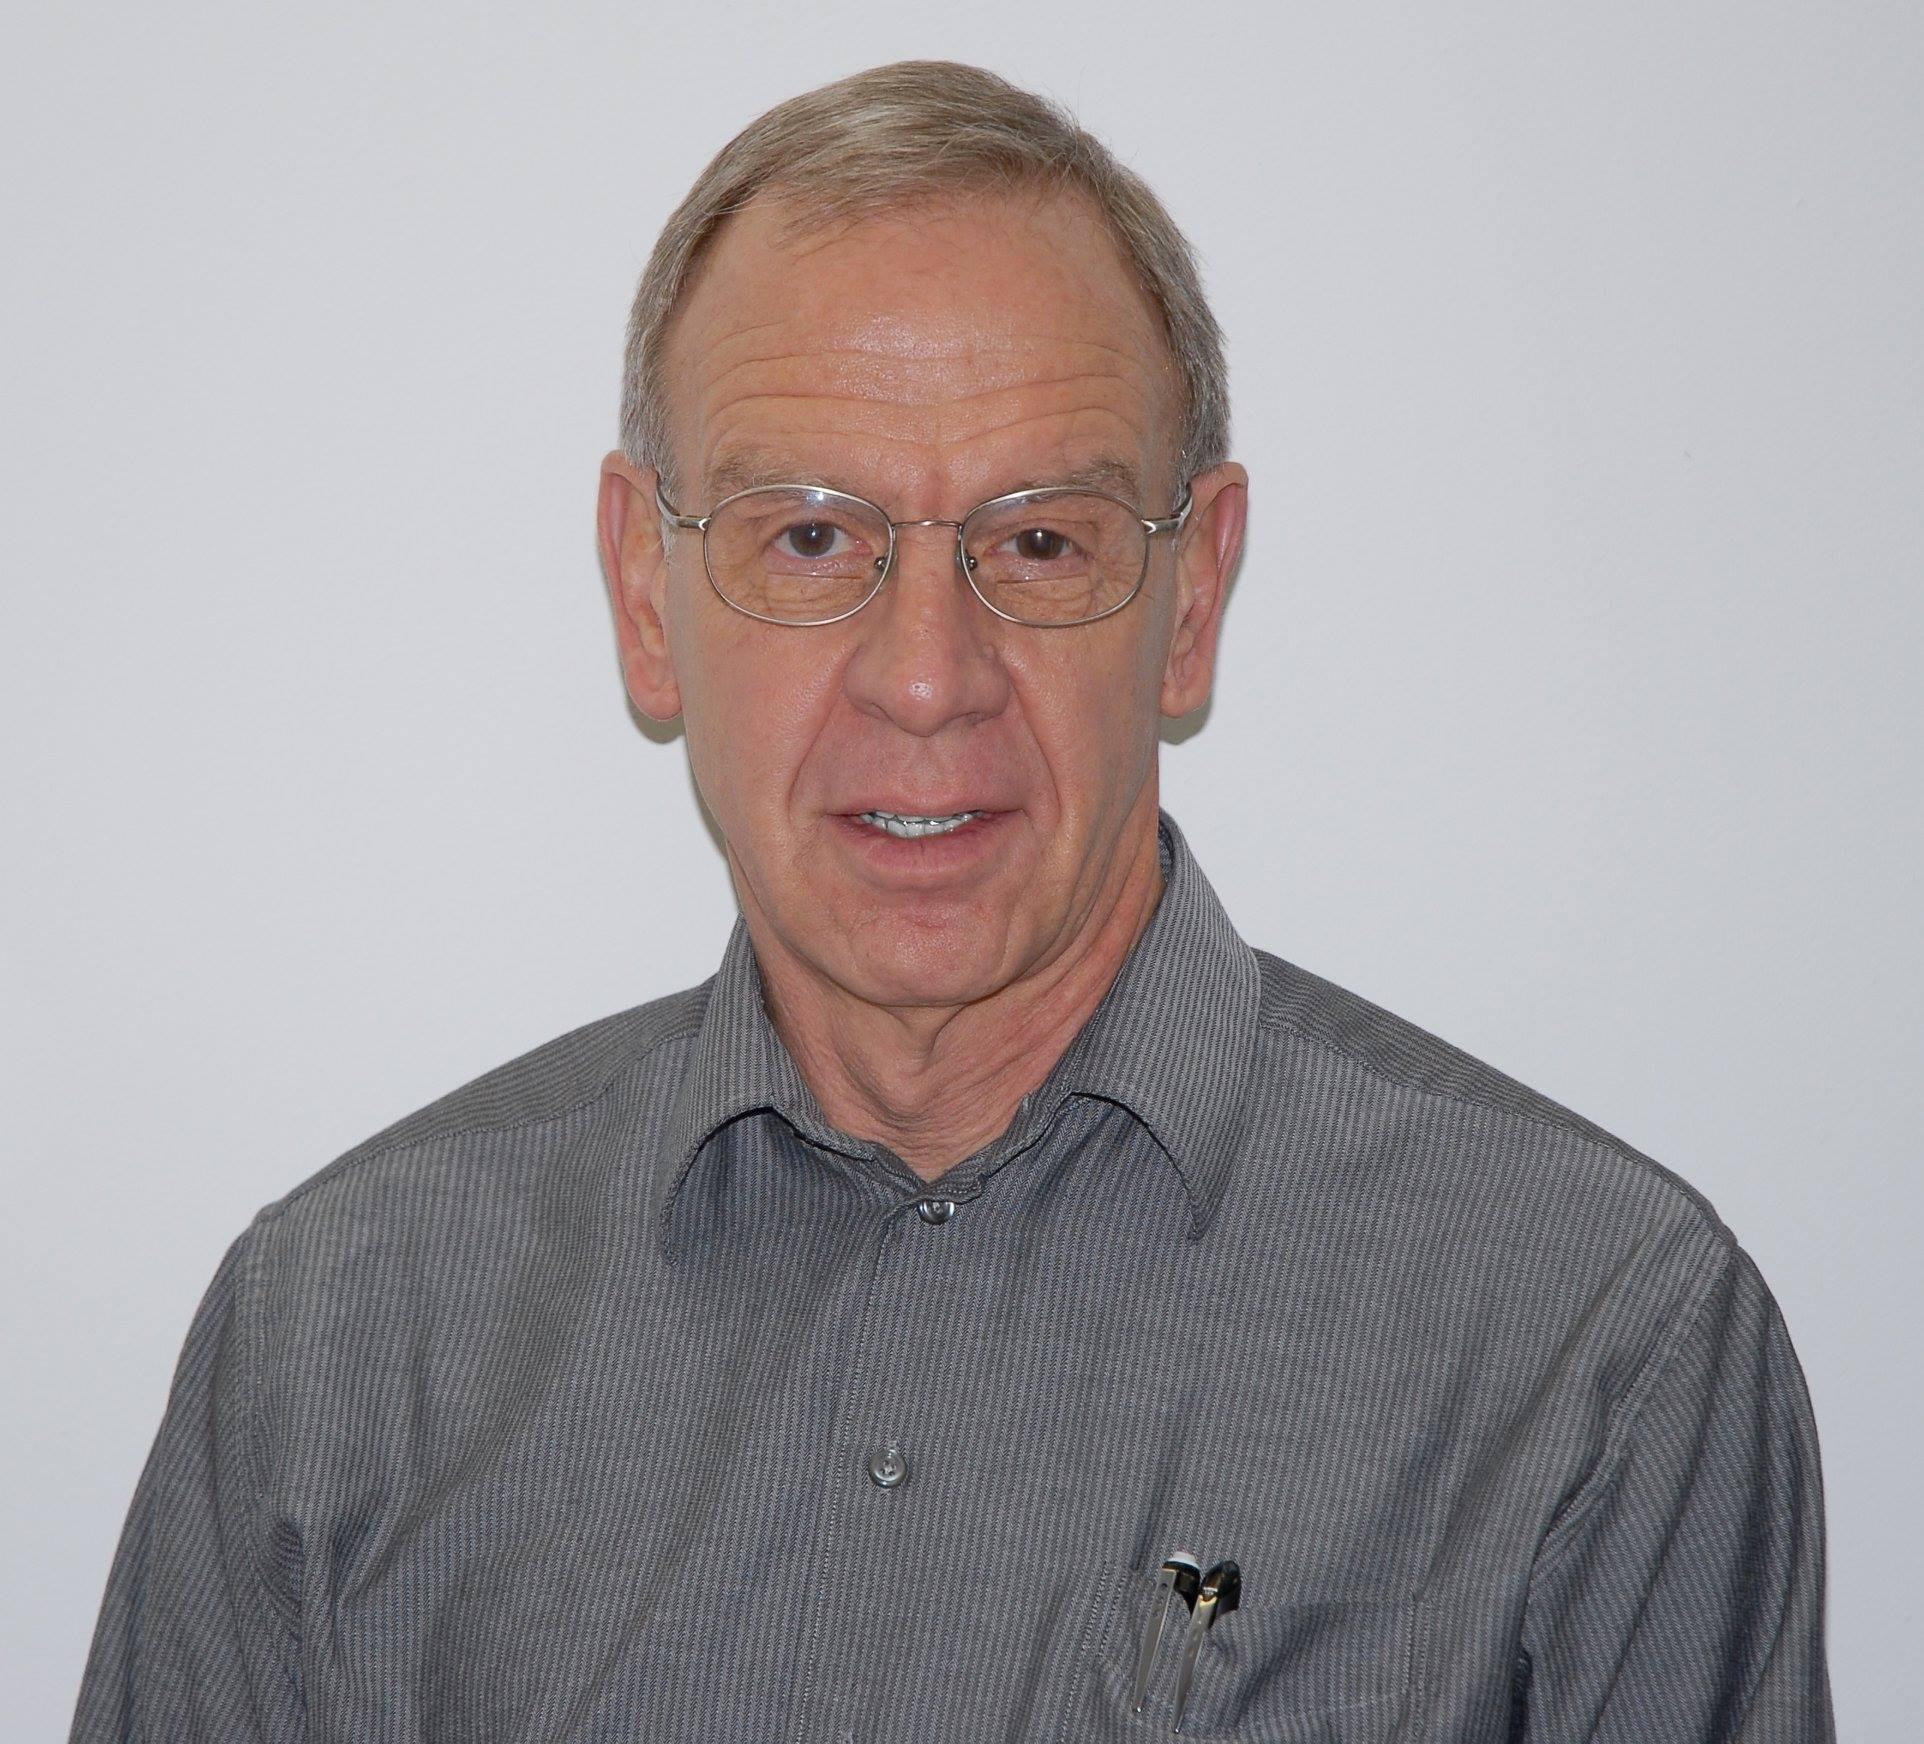 Dr. Robert Hubbard, HANS